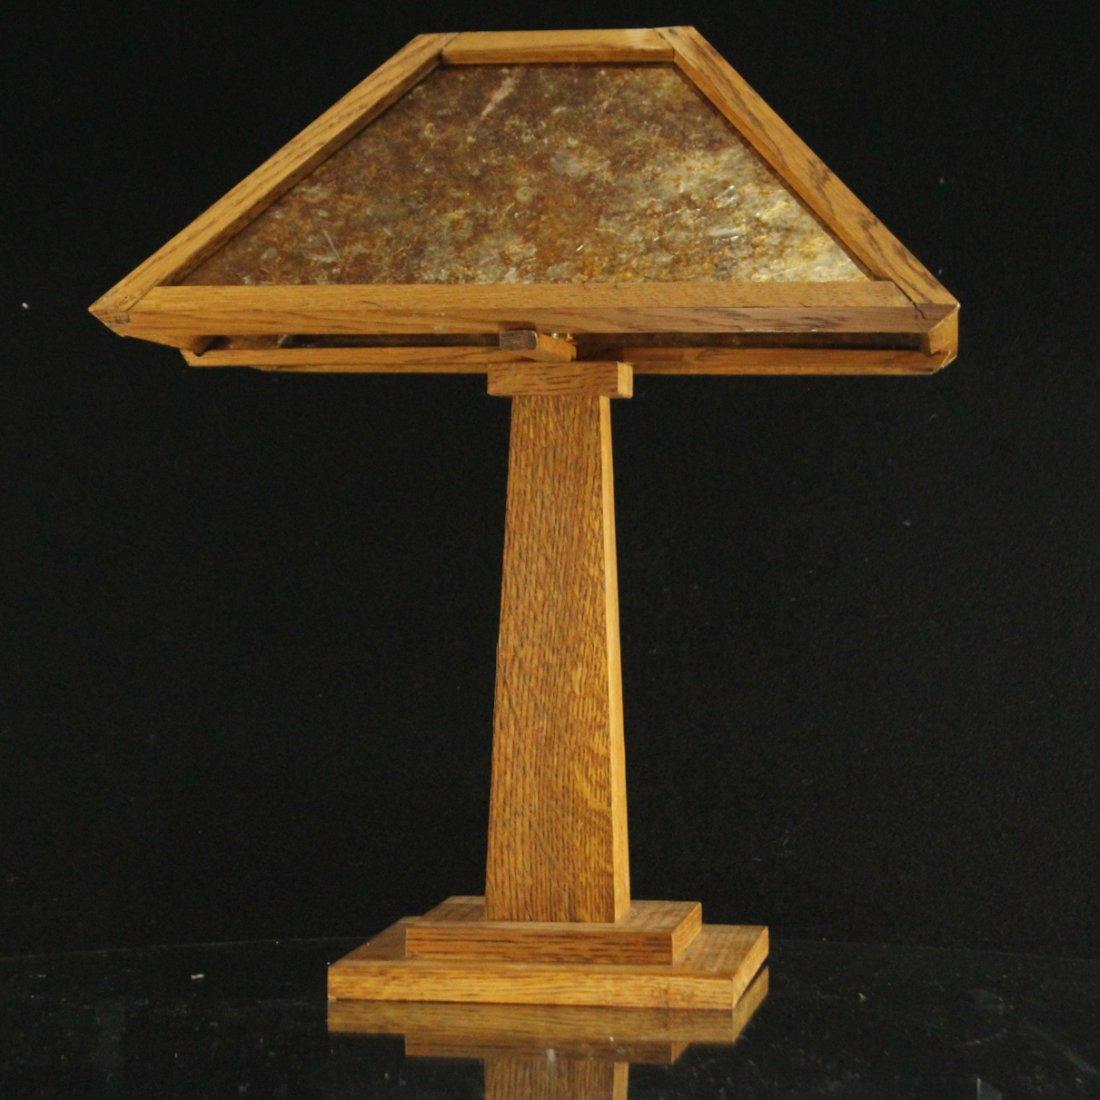 LEVENGER Arts& Crafts MISSION OAK TABLE LAMP MICA PANEL